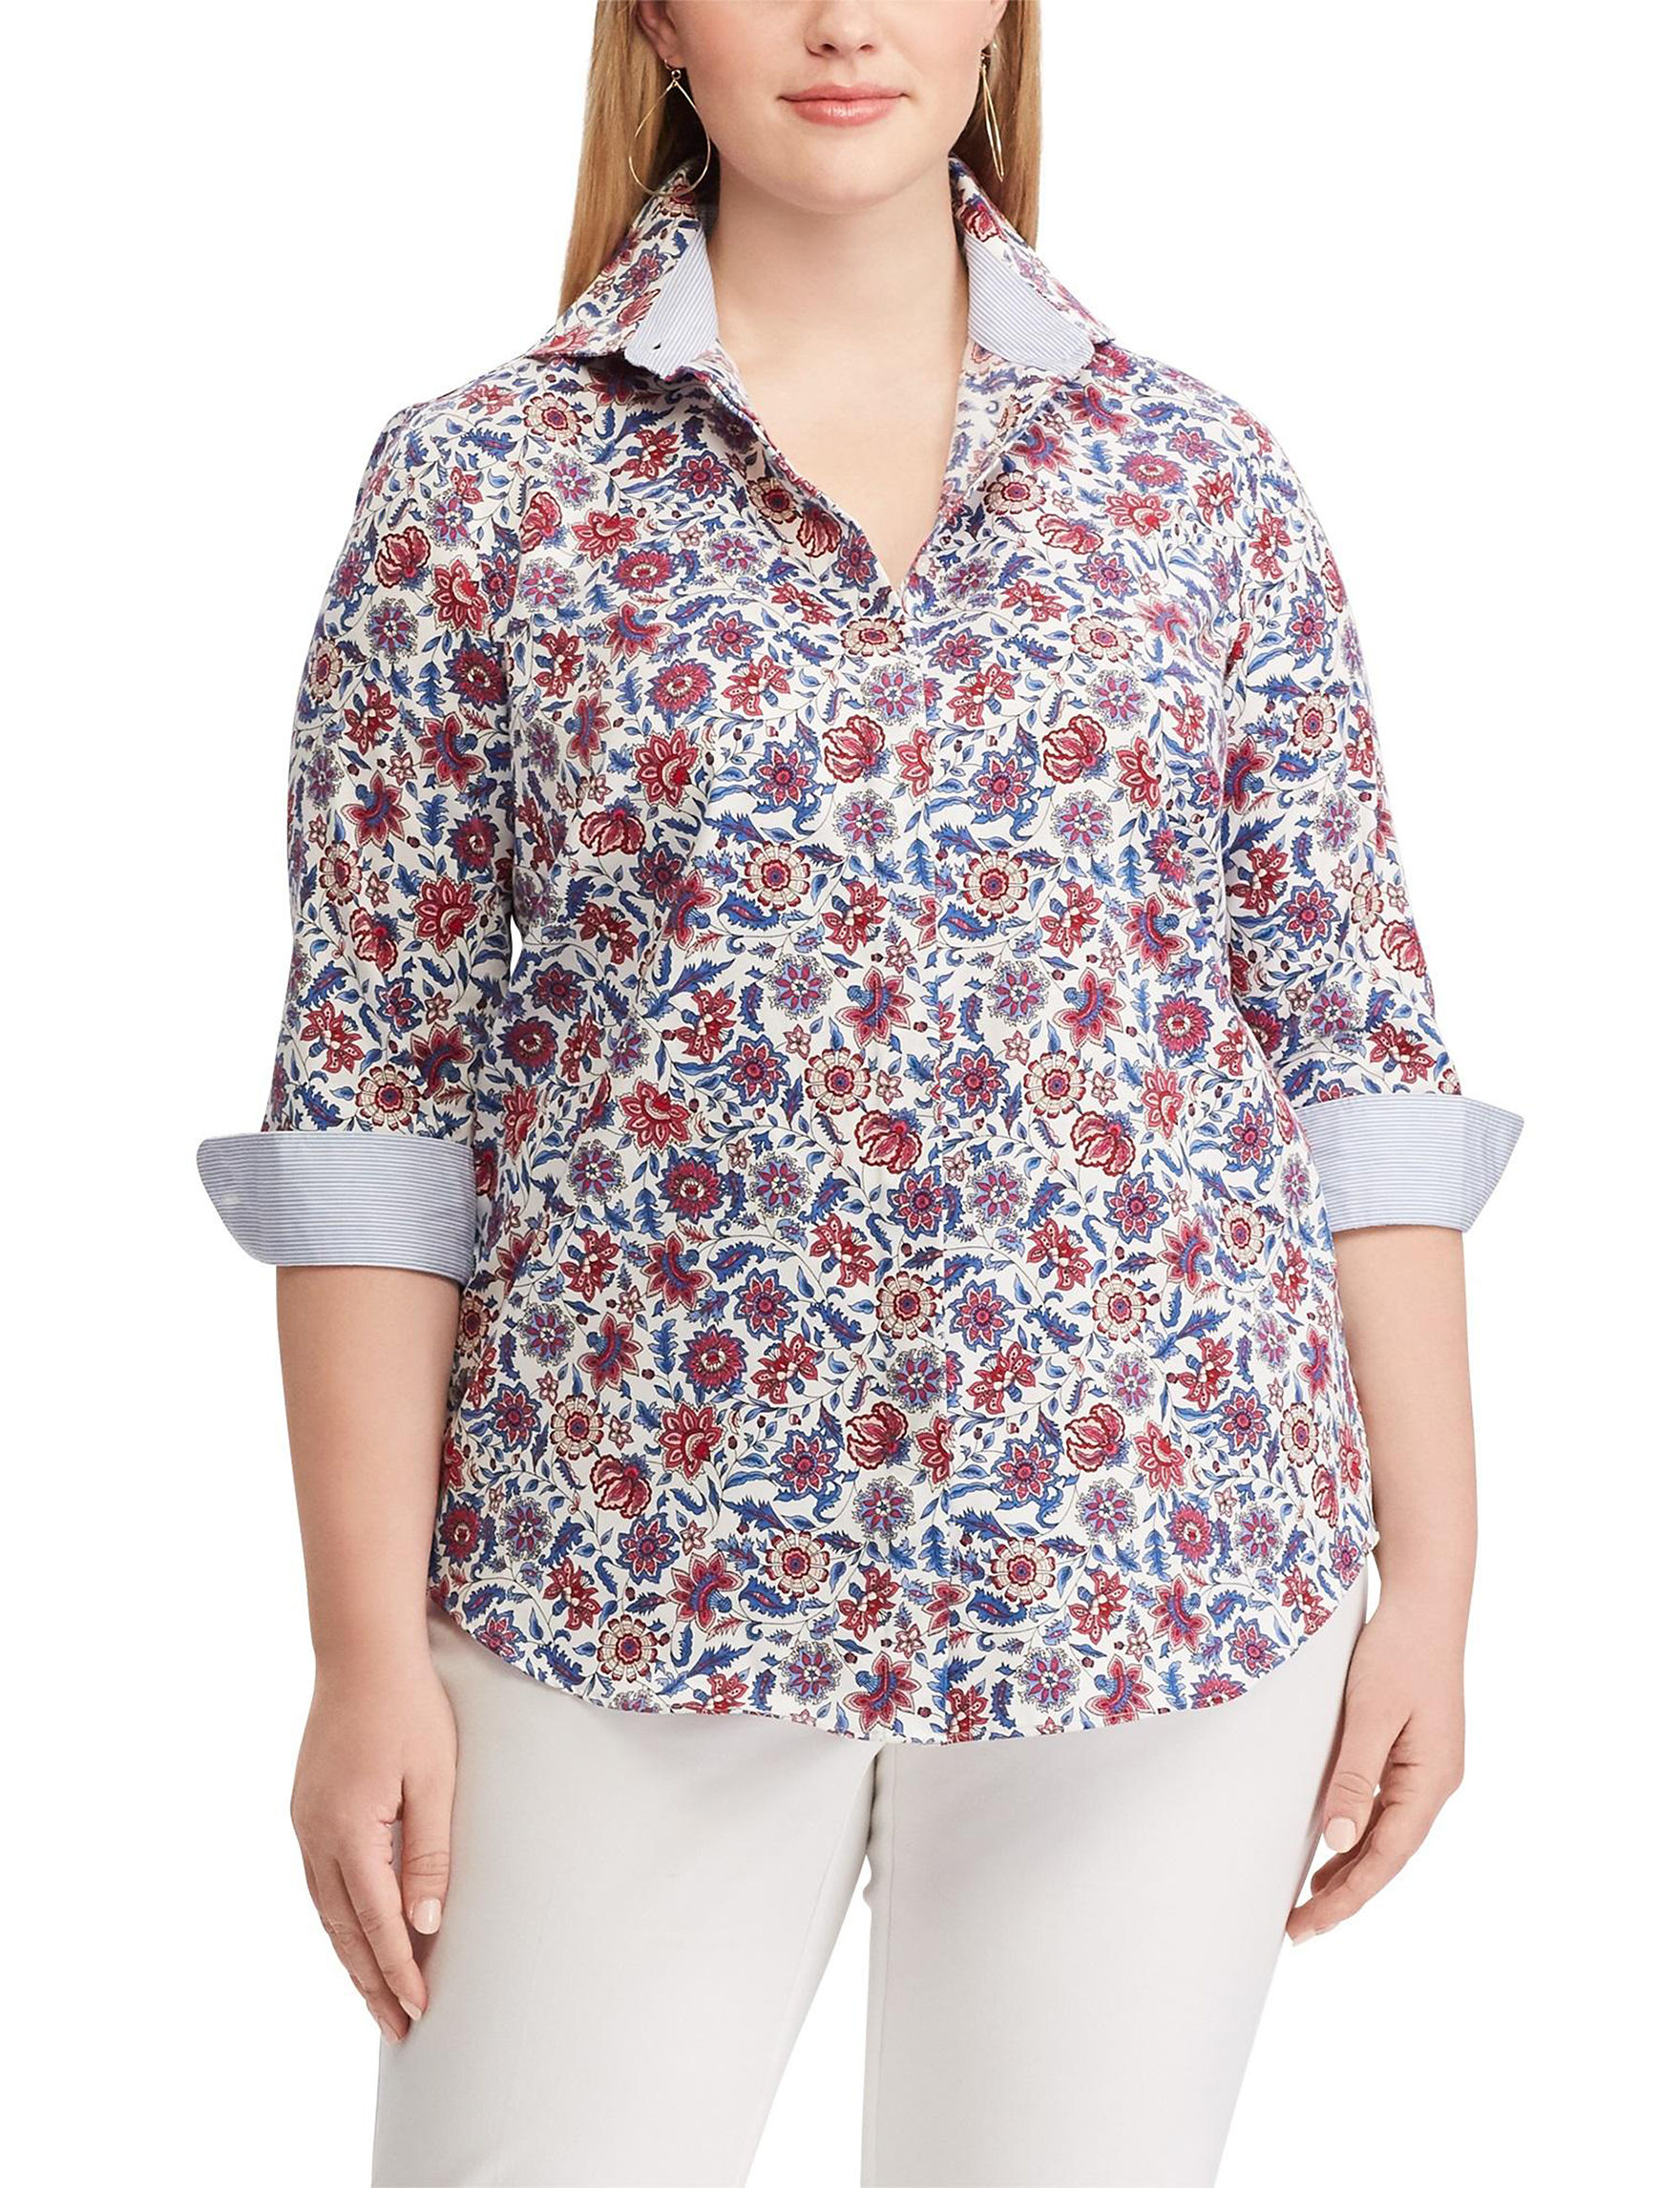 Chaps White Floral Shirts & Blouses